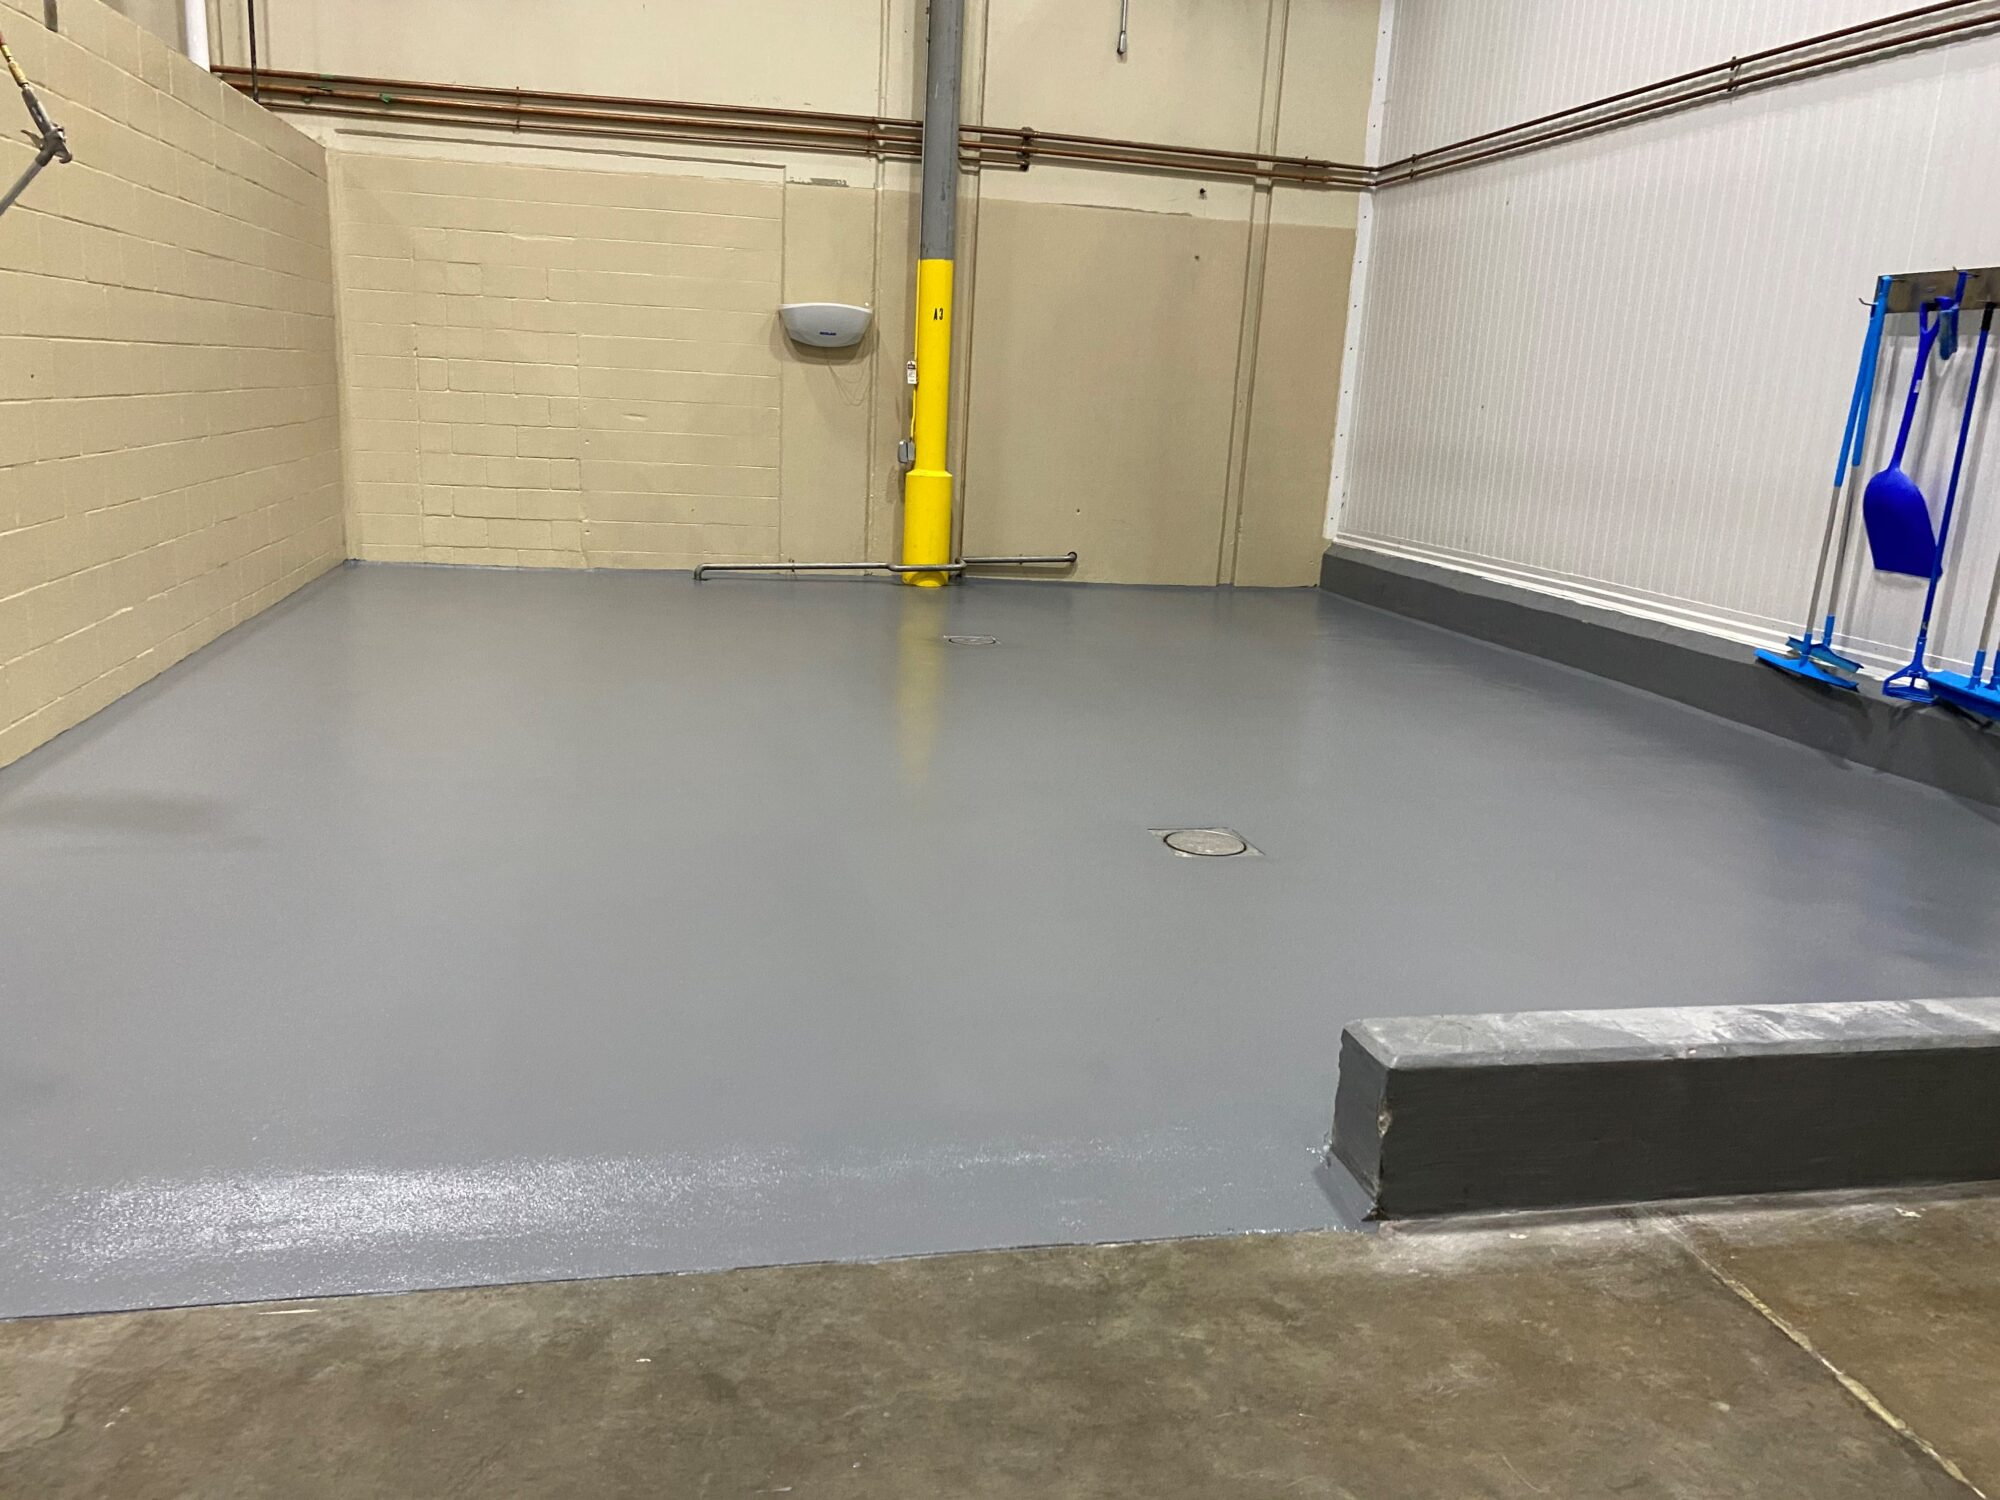 TeamIA, concrete floor resurfacing, industrial flooring, flooring contractors Jackson TN, urethane concrete, Industrial Applications Inc., Jackson TN